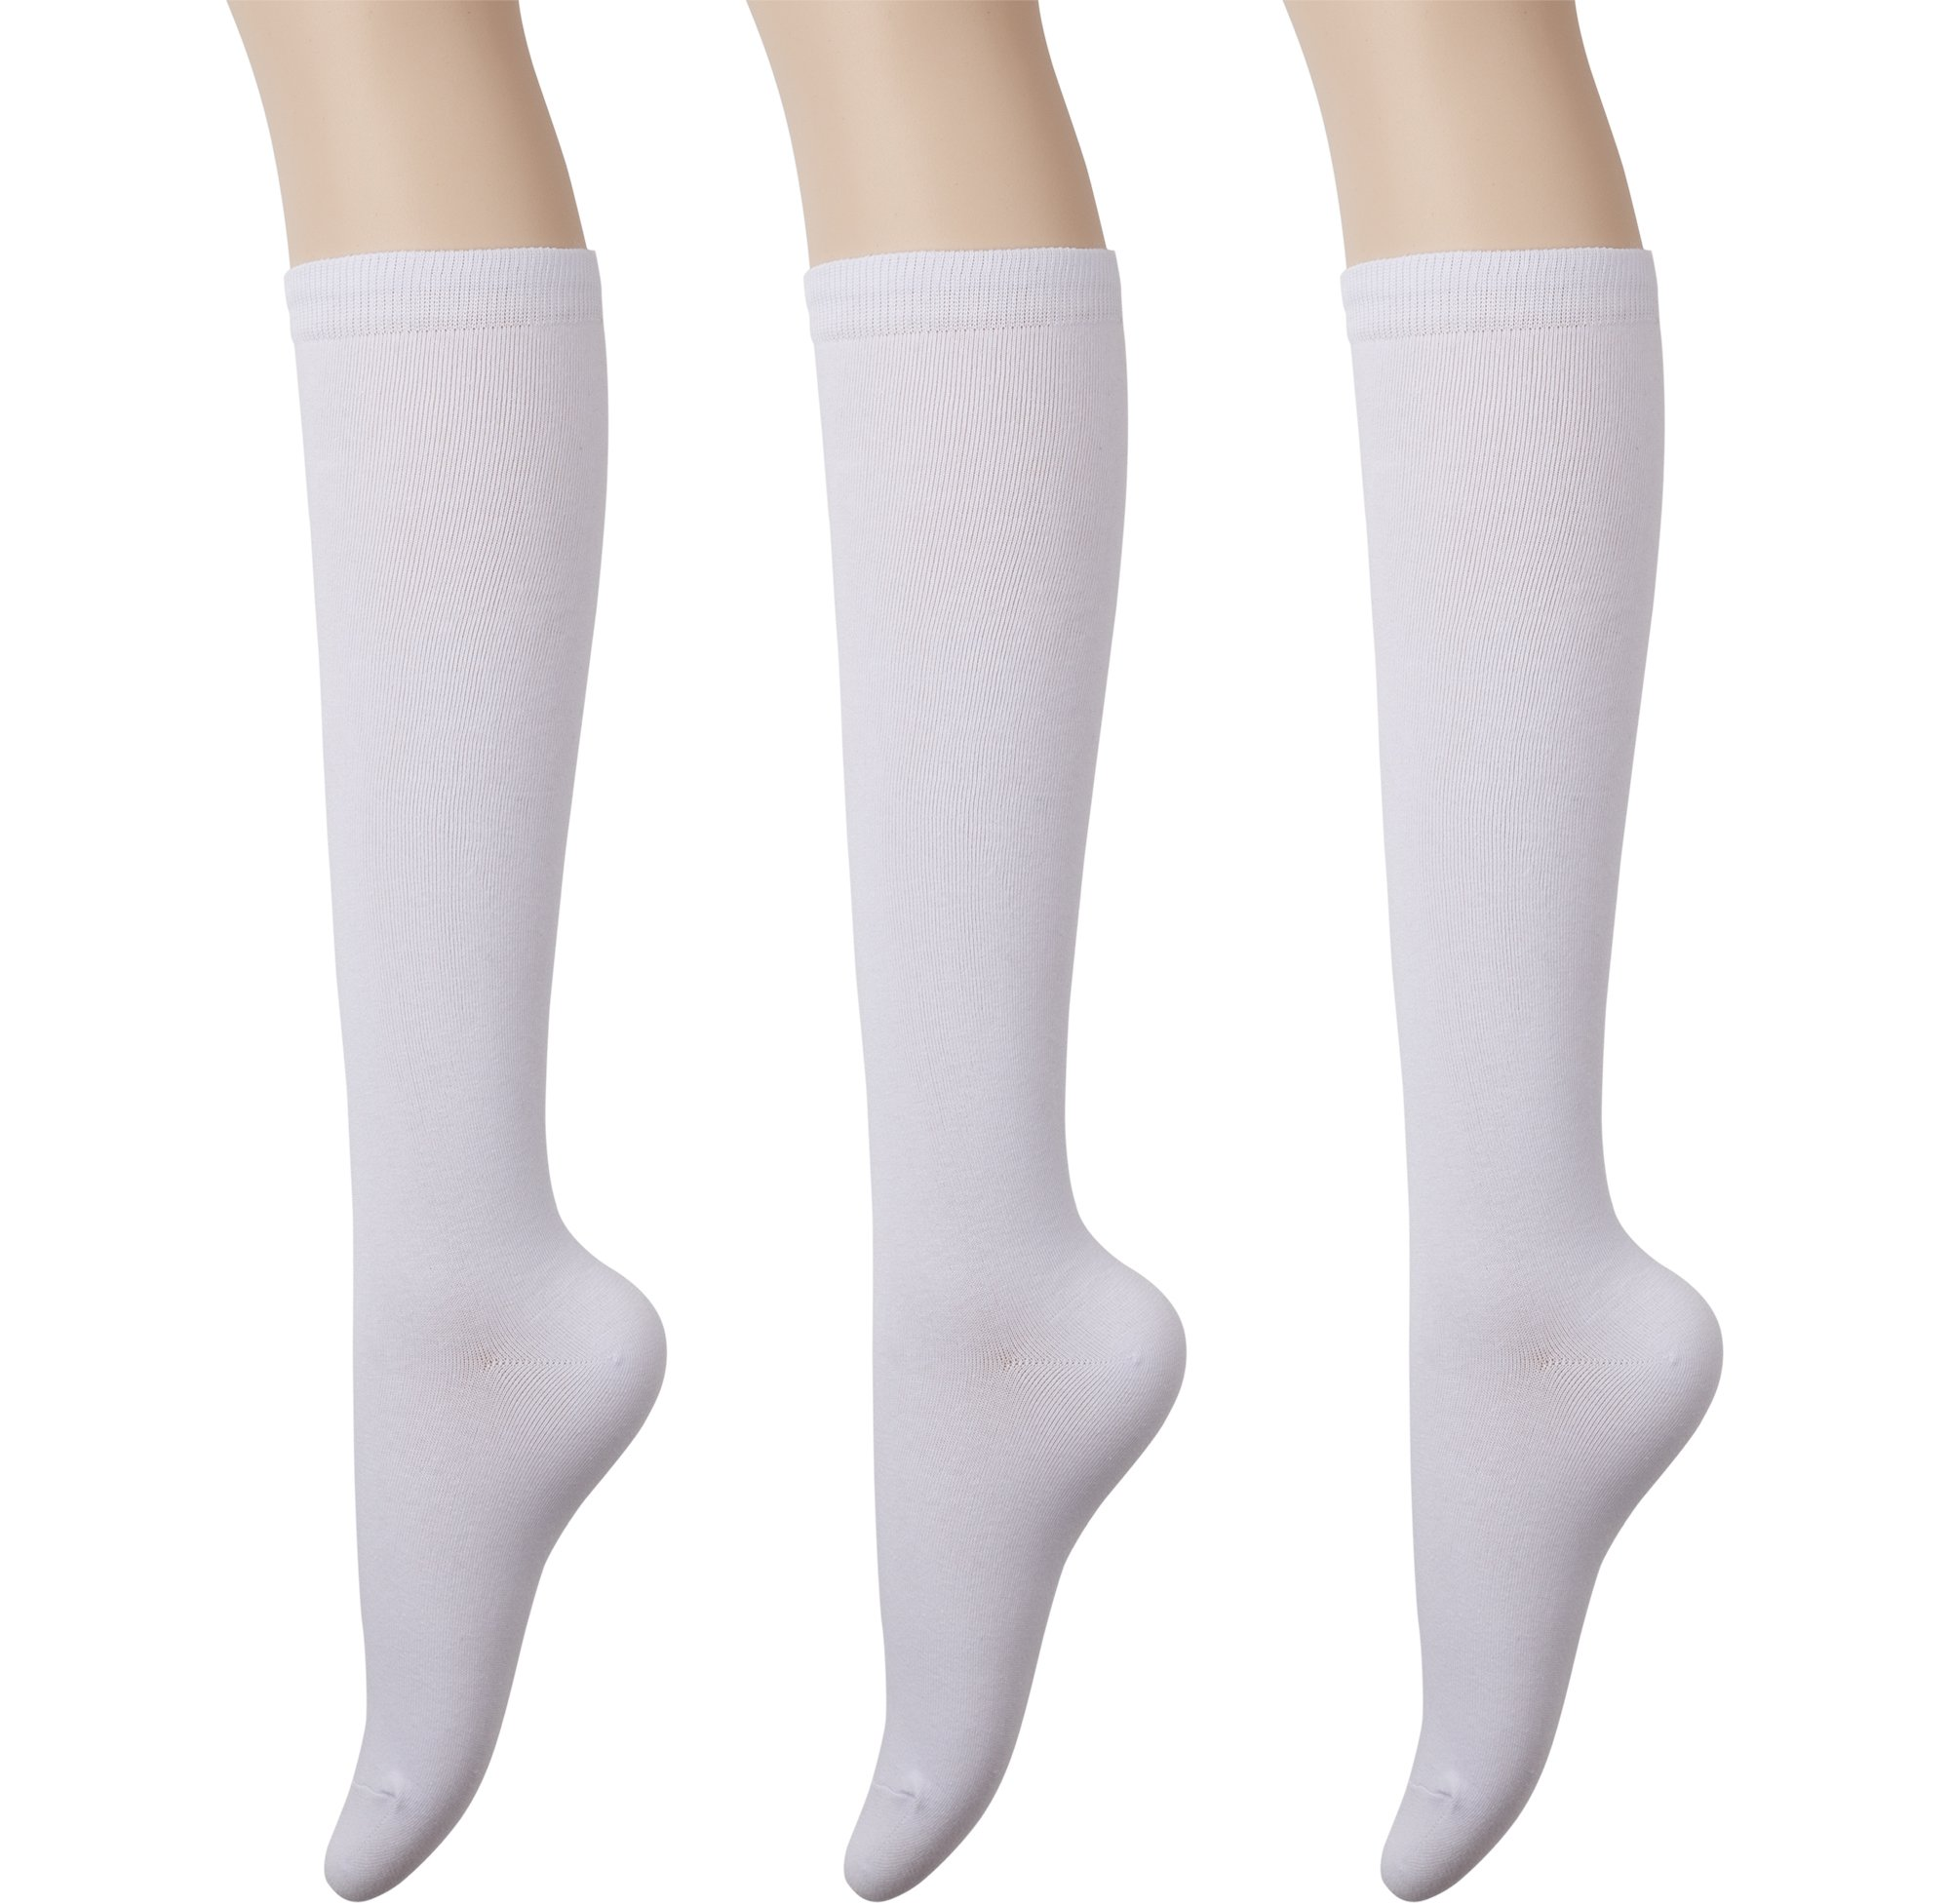 KONY Womens Cotton Knee High Socks - Casual Solid & Triple Stripe Colors Fashion Socks 3 Pairs (Womens Shoe Size 5-10) (Solid White - 3 Pairs)